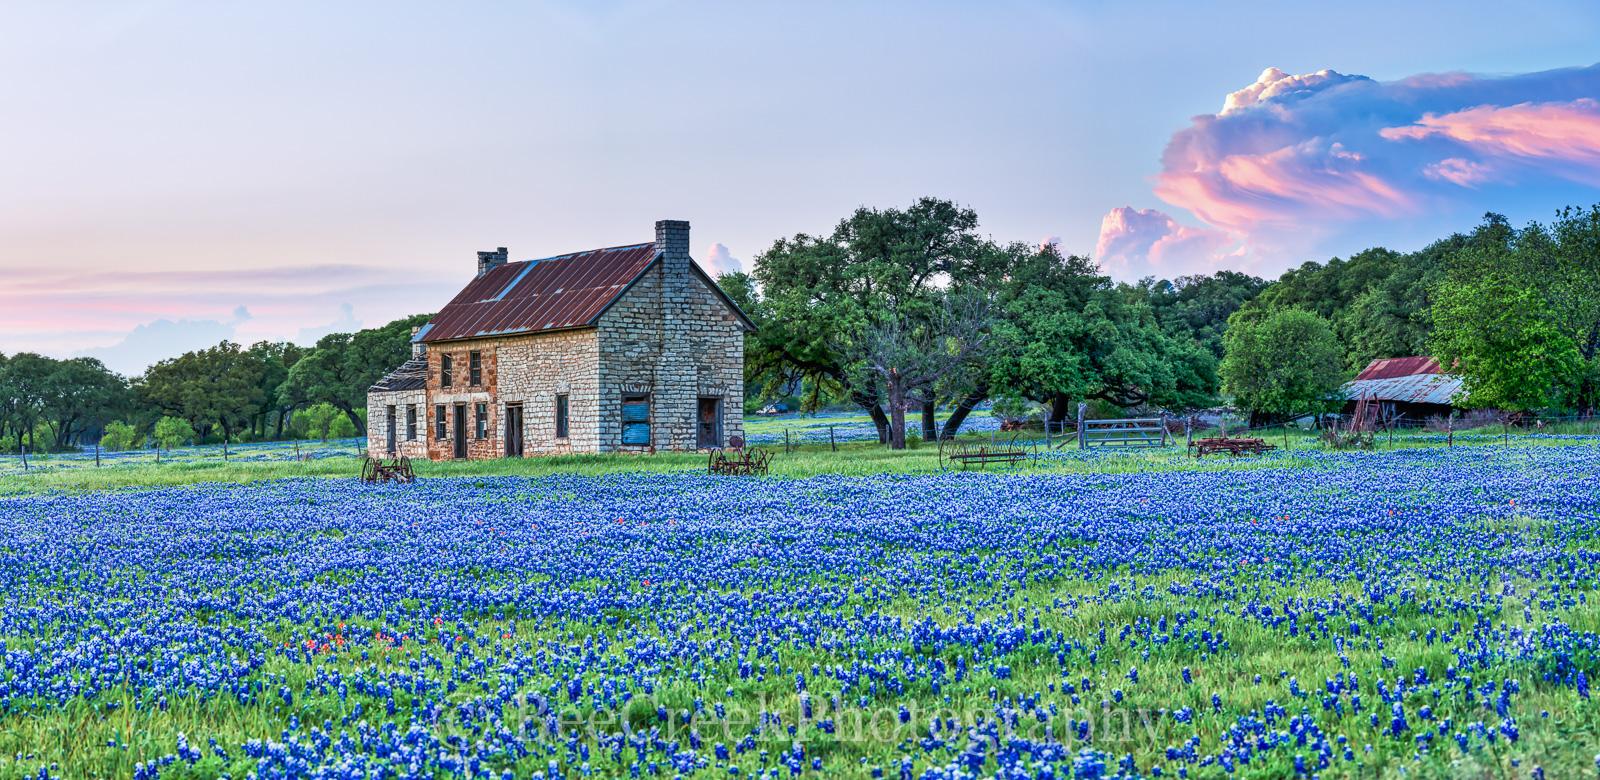 Bluebonnet, bluebonnets, blue bonnets, bluebonnet house, Marble Falls,  farm house, storm cloud, sunset, stone farm house, farm equipment, landscape, indian paint brush, red, wildflowers,, photo